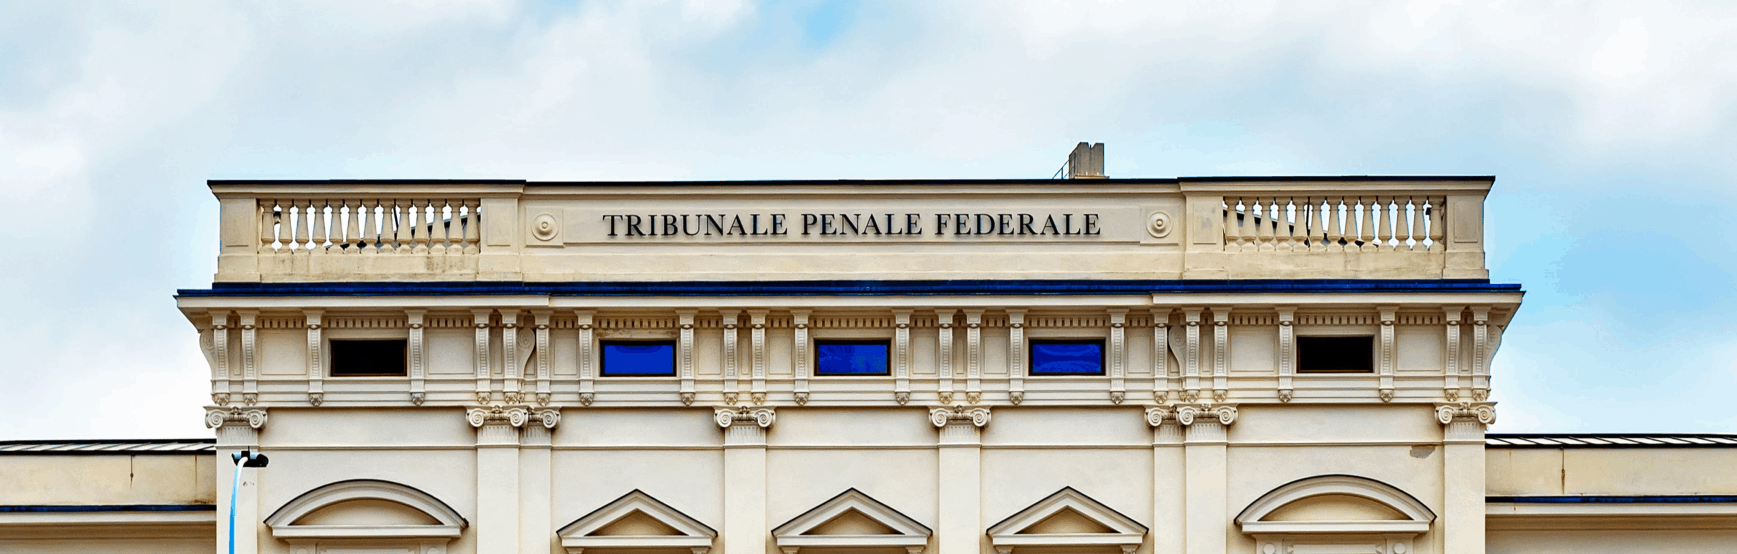 swiss federal criminal court